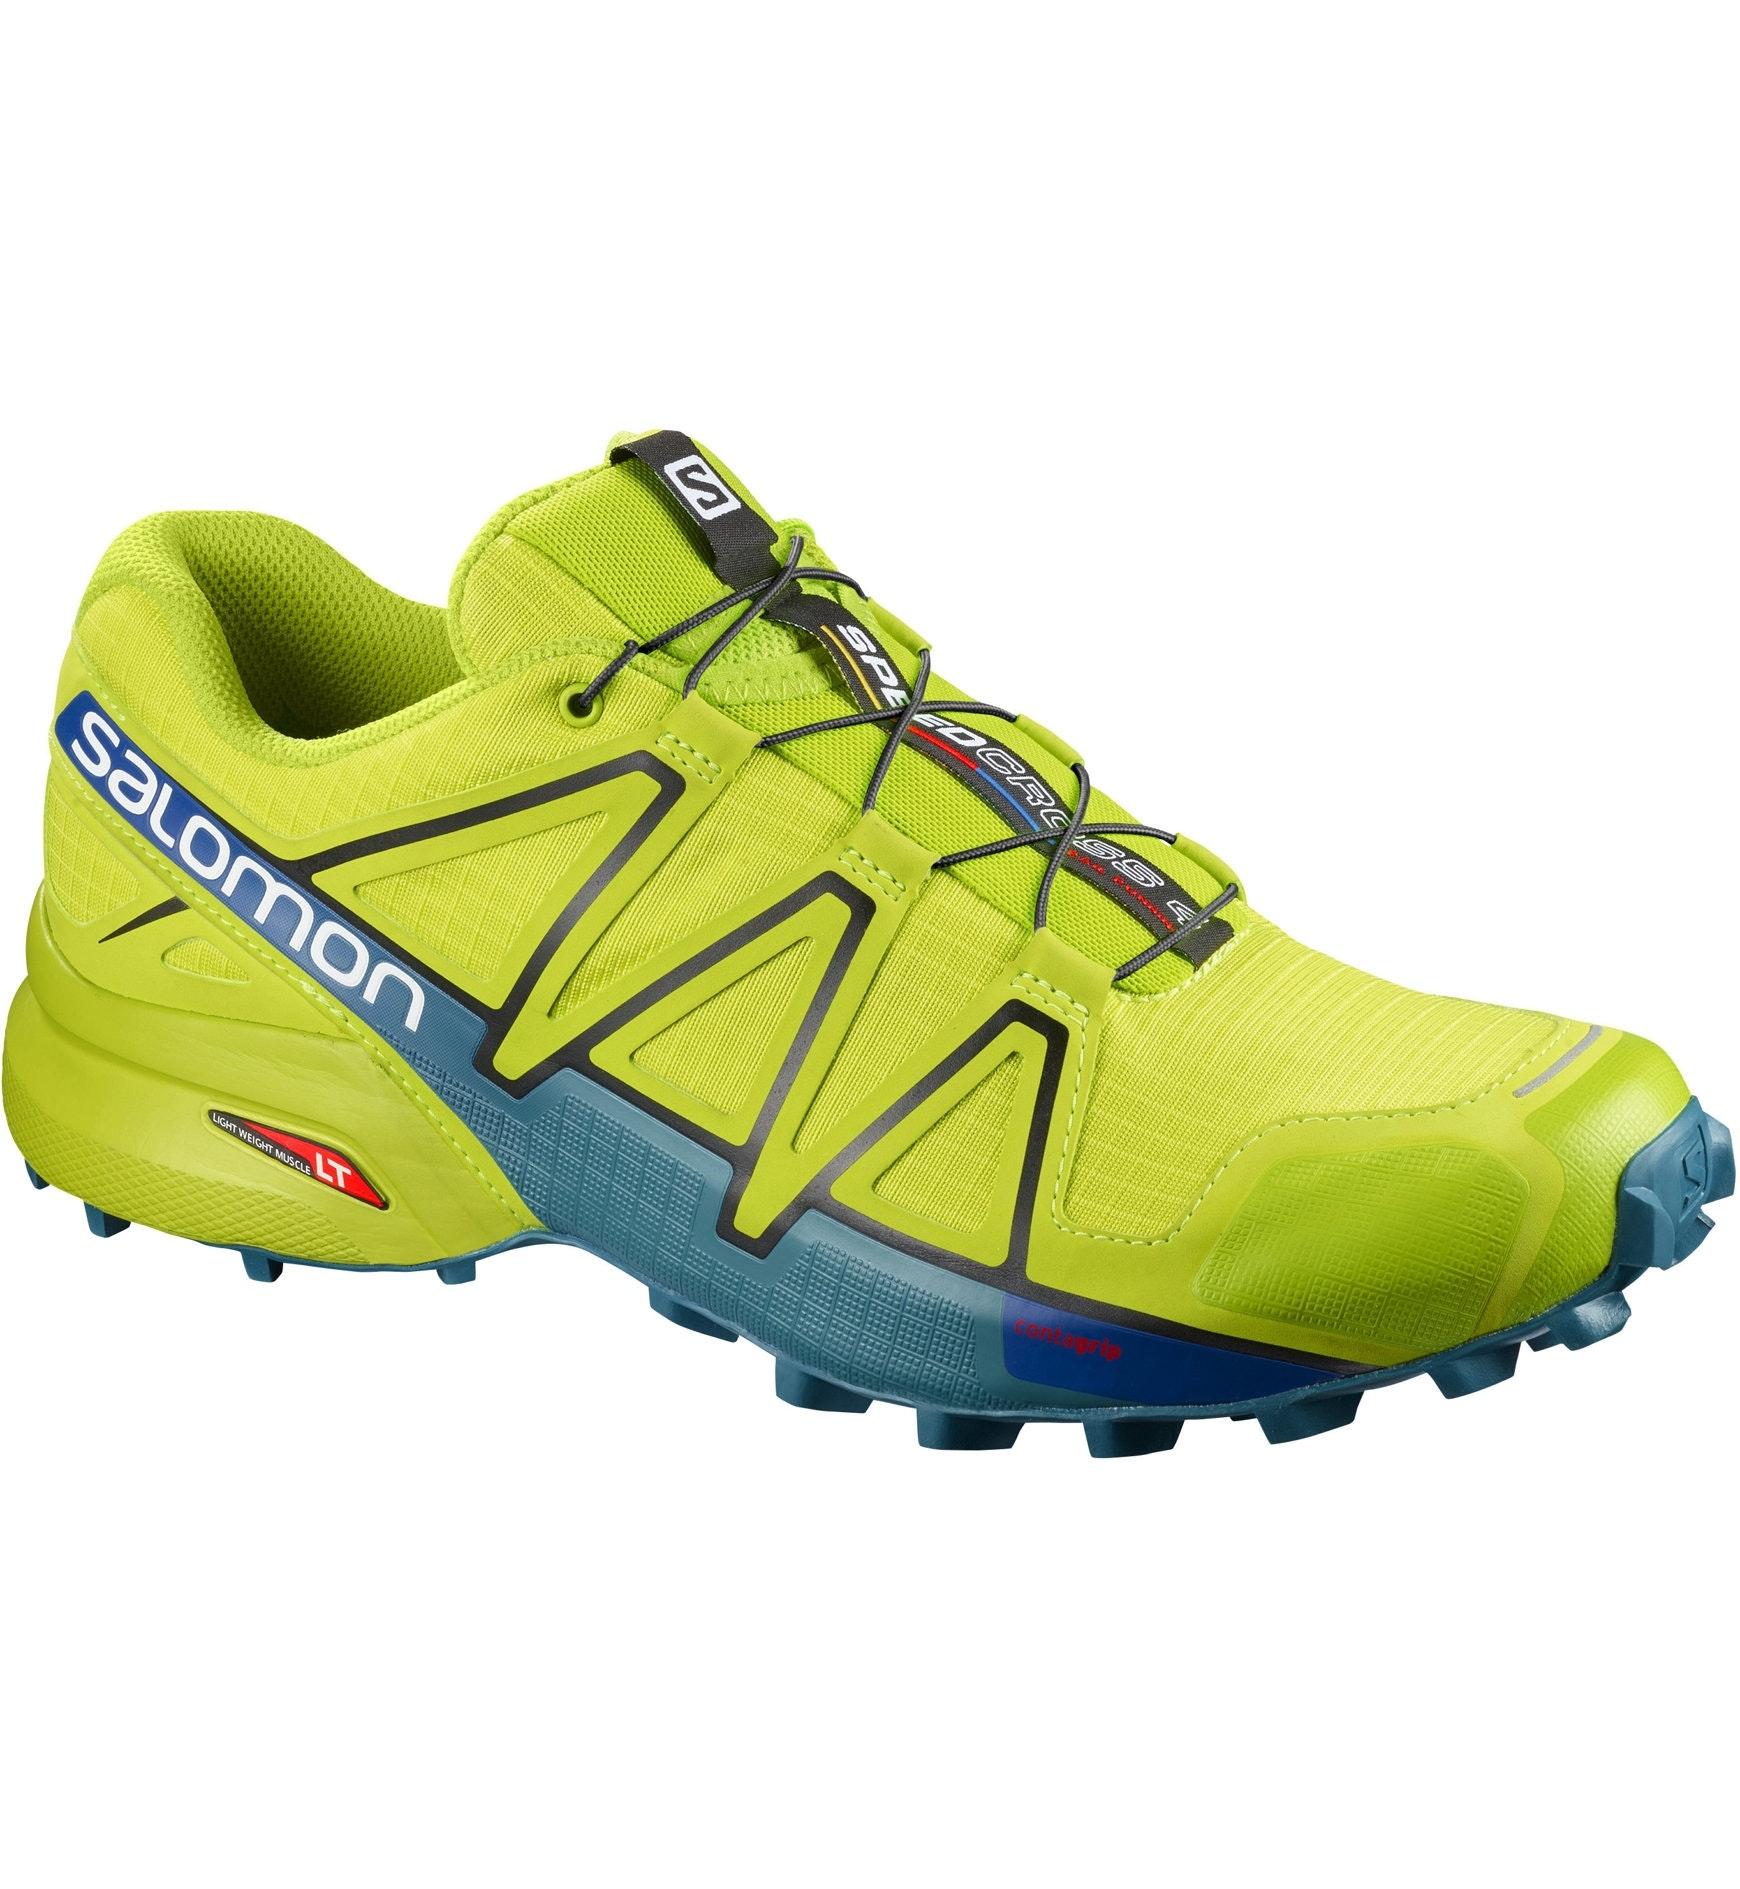 Salomon Speedcross 4 - scarpe trail running - uomo